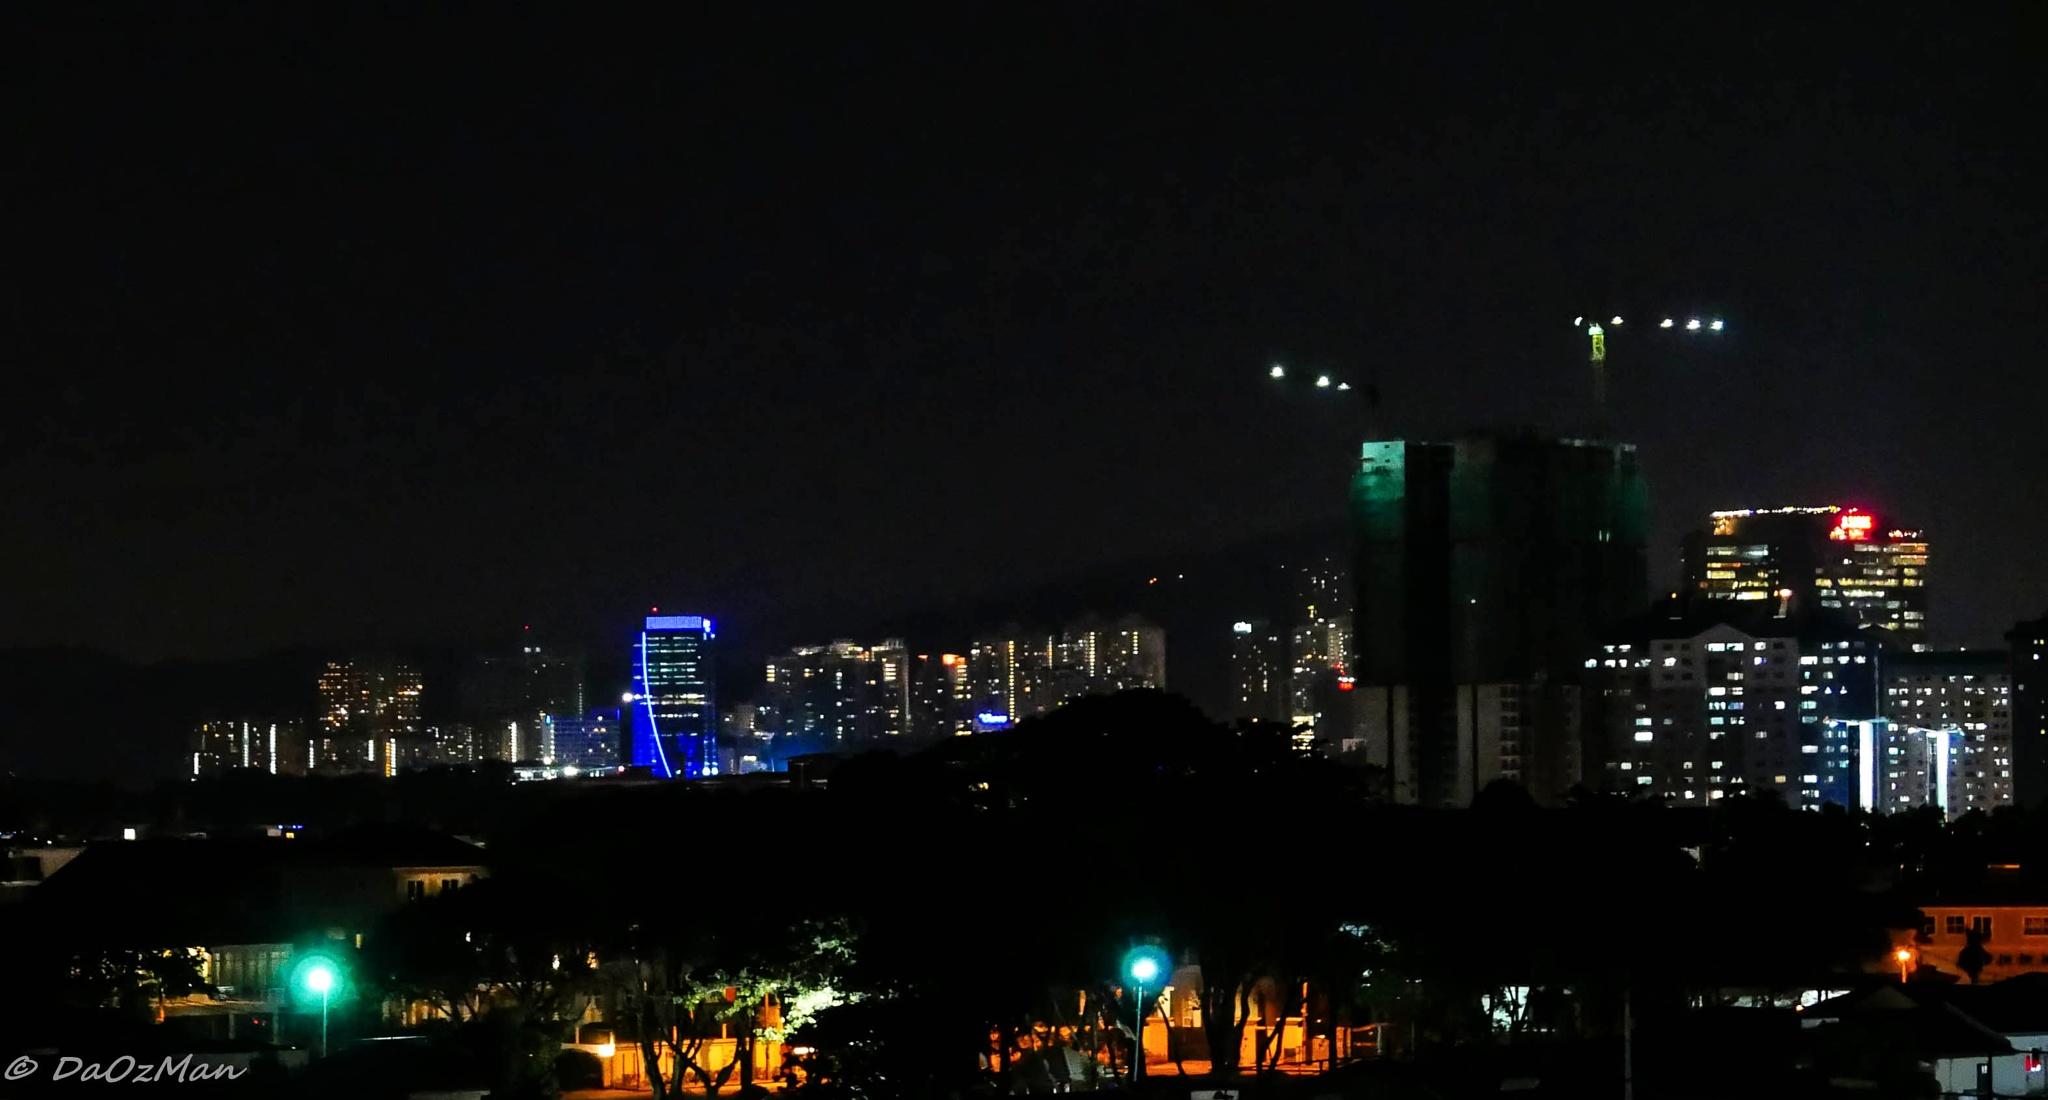 City lights by DaOzMan